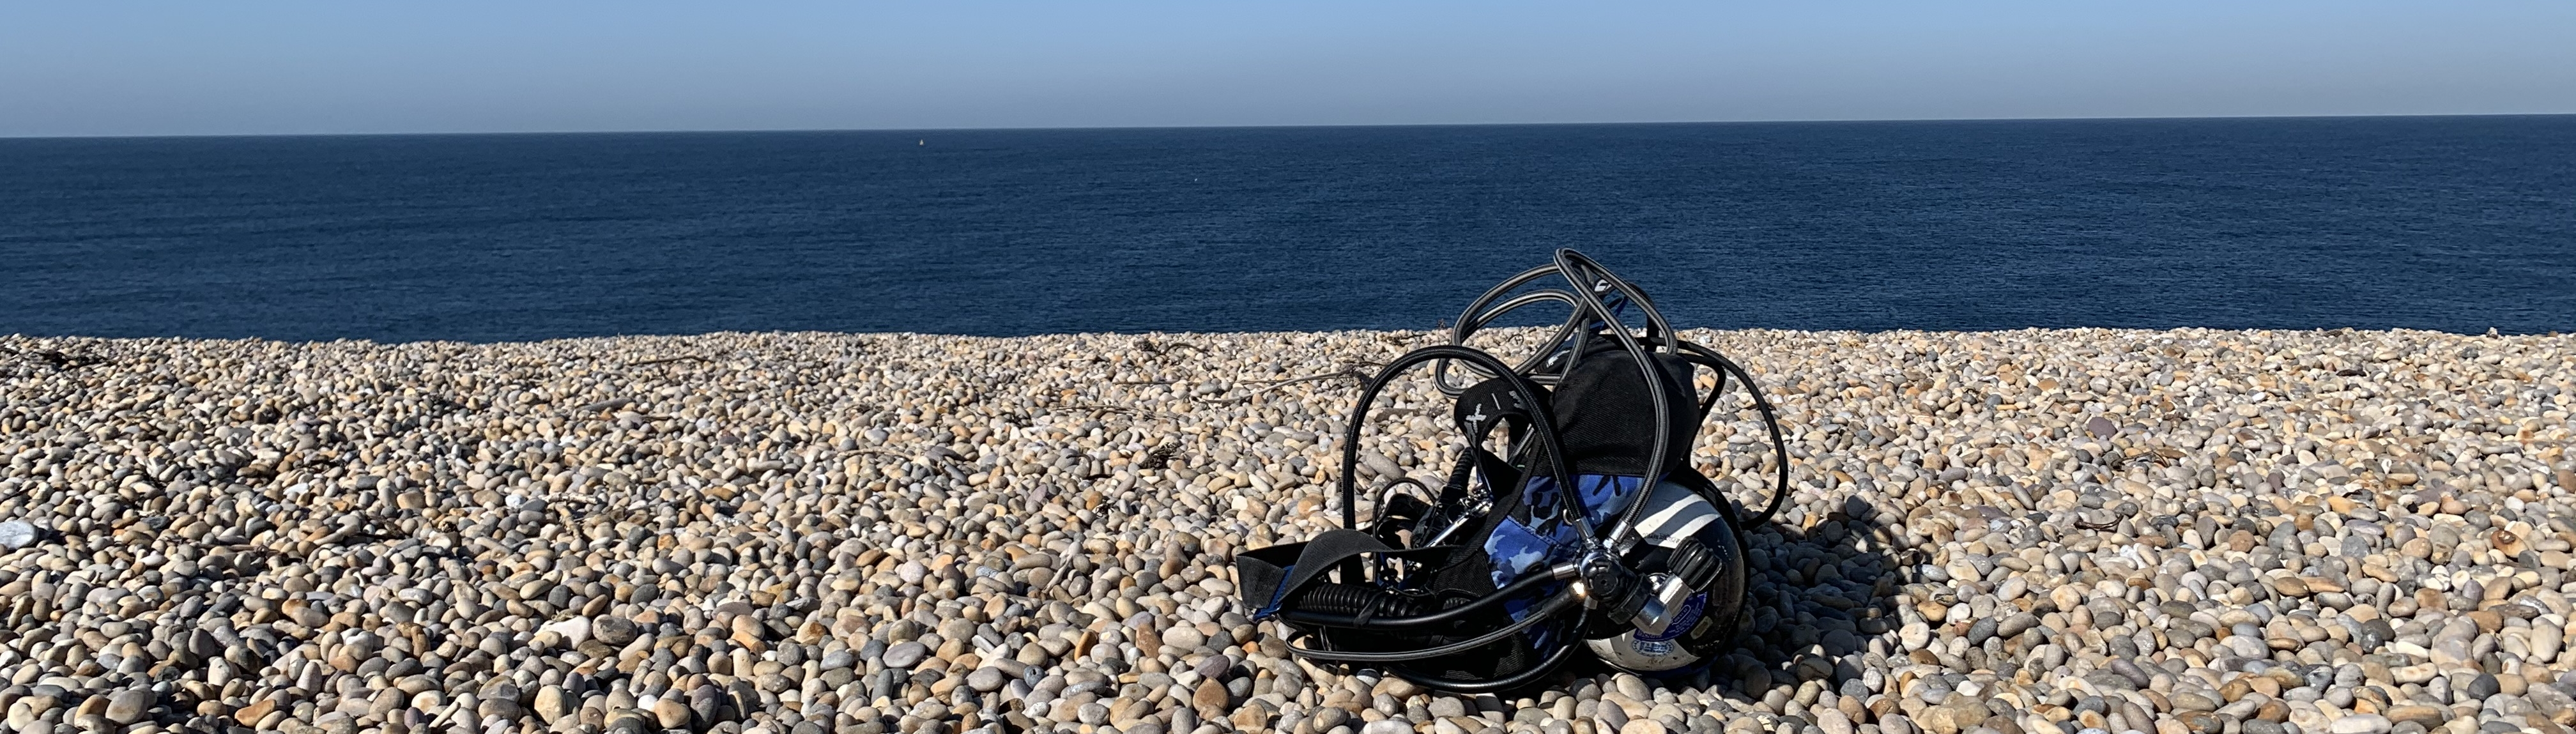 Chesil Beach & Kit